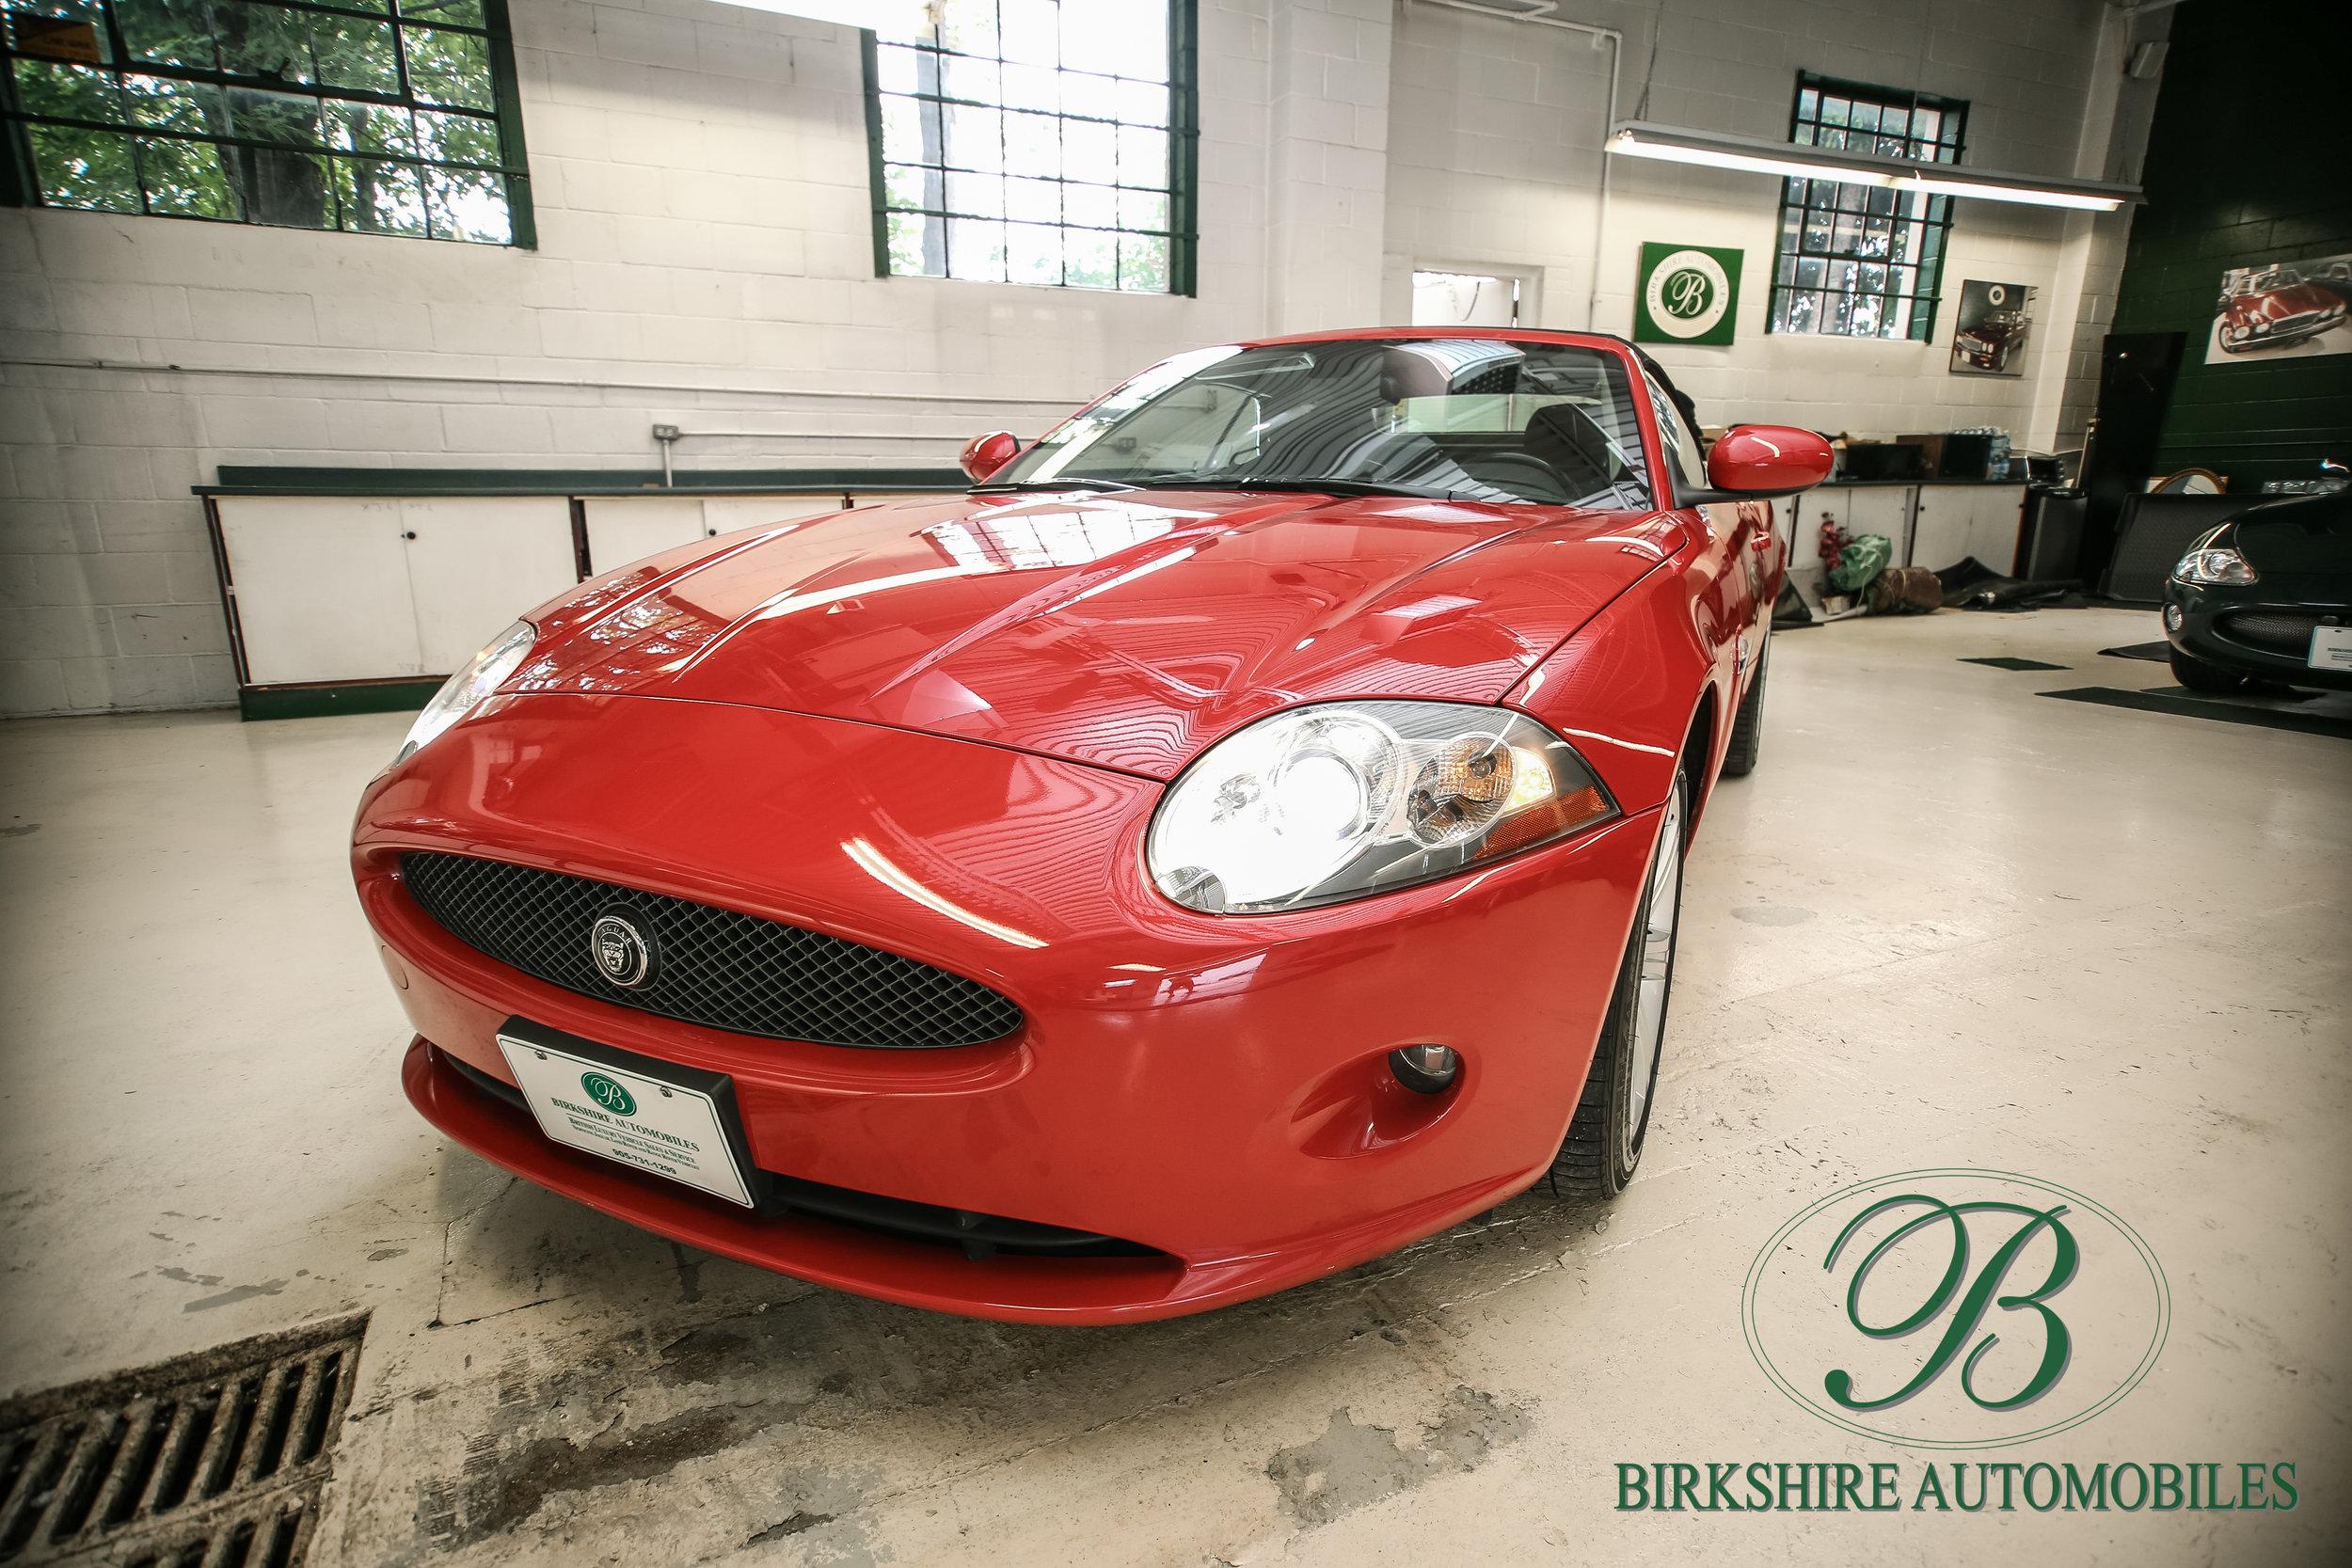 Birkshire Automobiles-66.jpg